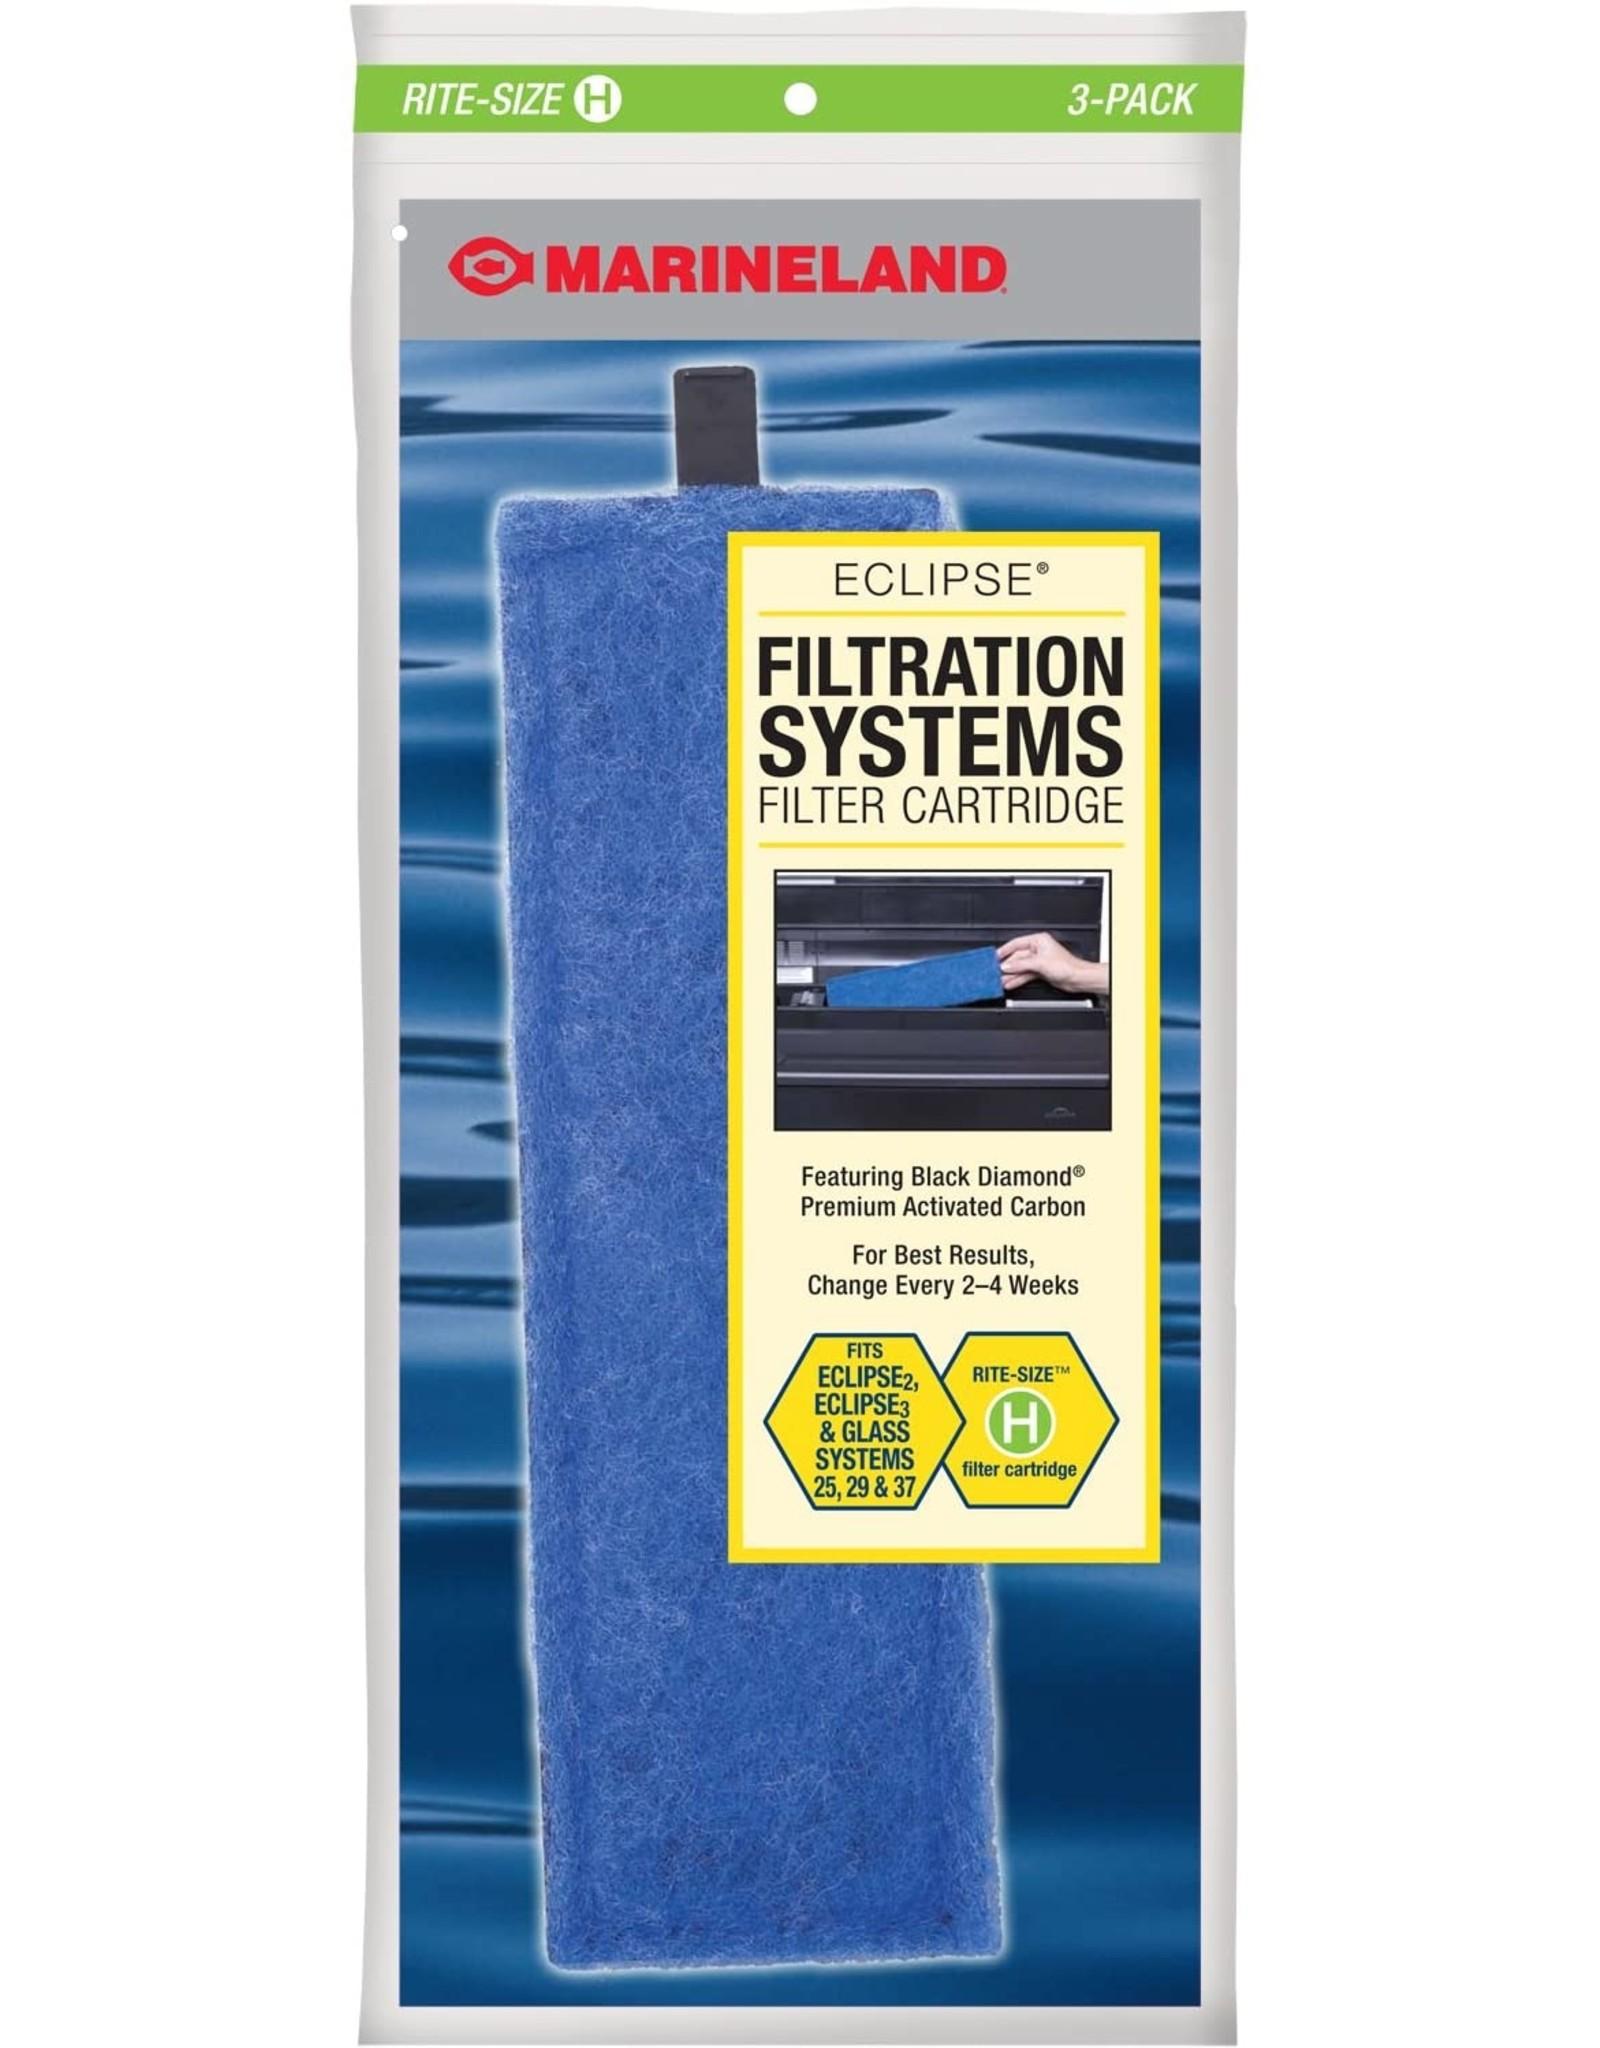 Marineland MARINELAND Rite Size Cartridge H 3 Pack